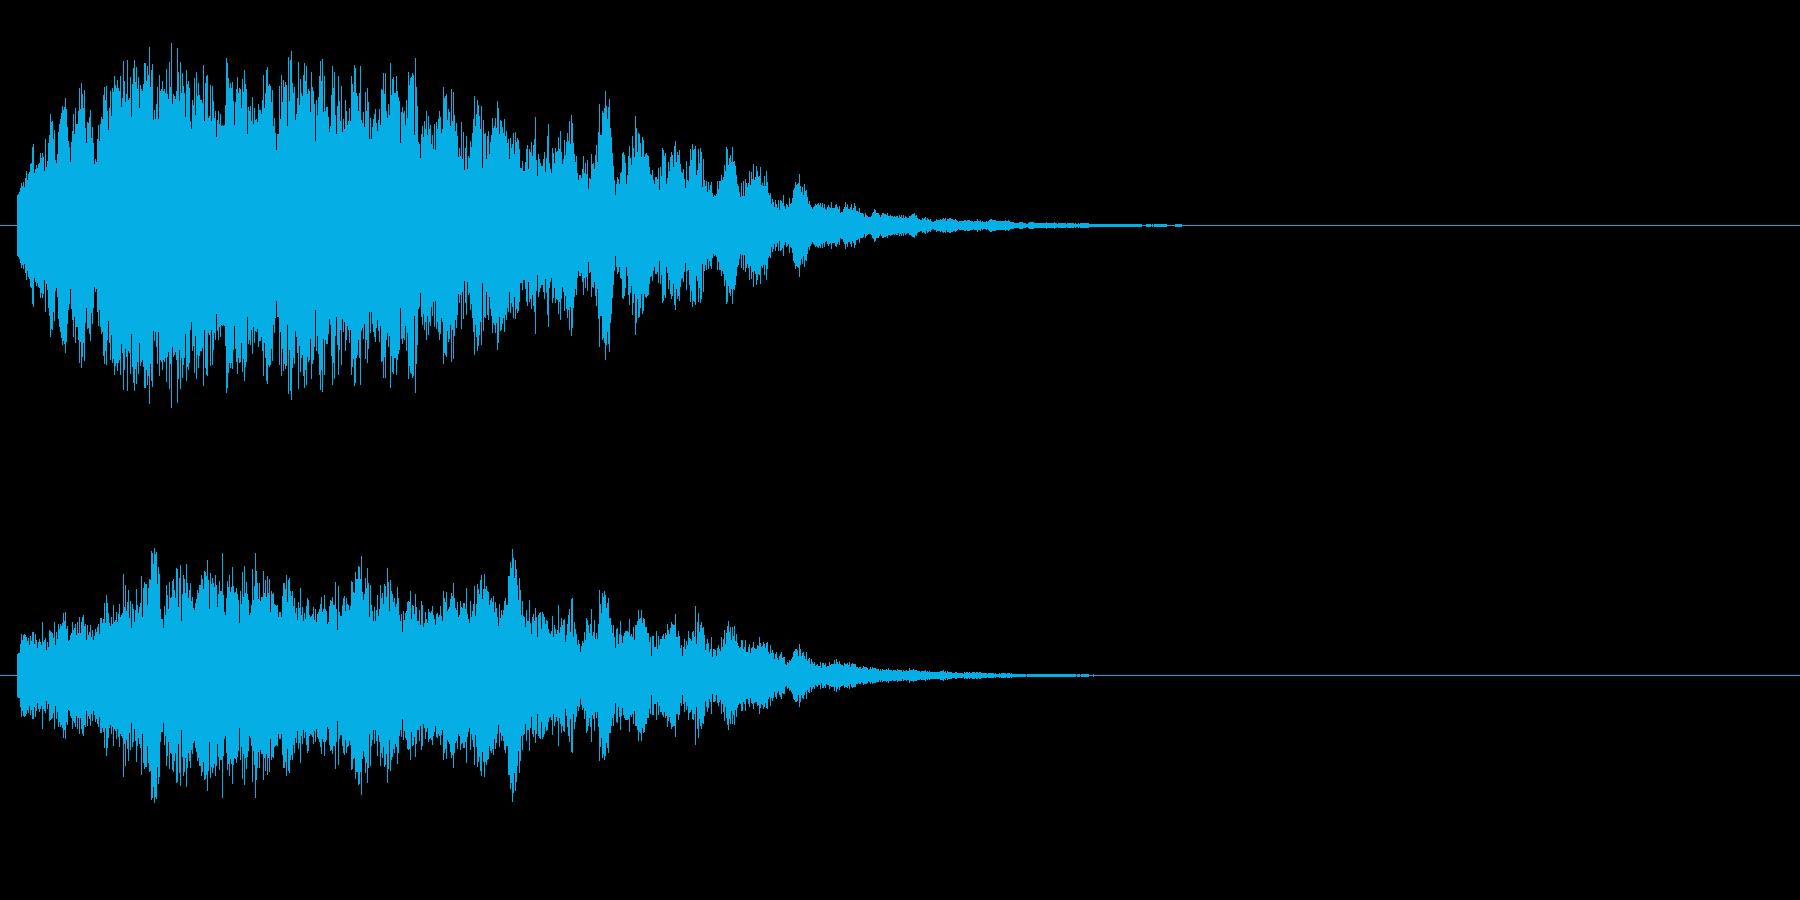 浮遊 神秘 幻想 不思議 雪 宇宙 深海の再生済みの波形